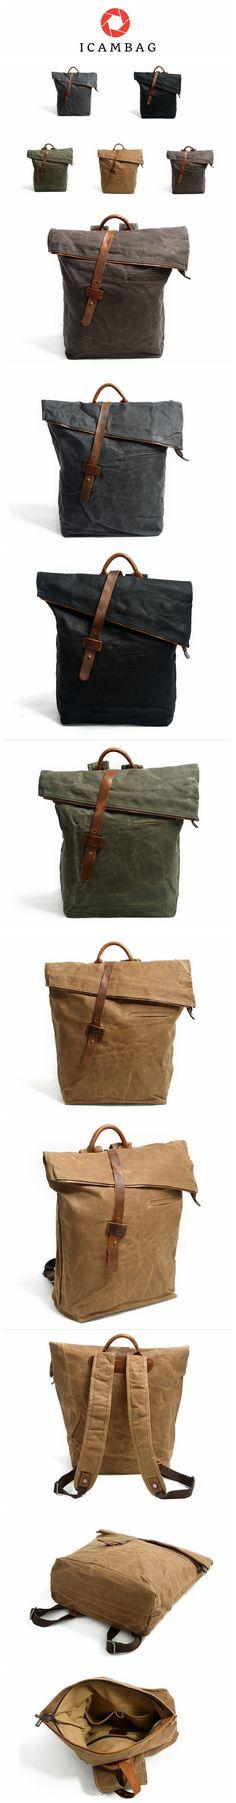 03efc63e872b icambag is a High Quality Design Handmade Leather and Canvas Bag Shop. Canvas  HandbagsCanvas Tote ...